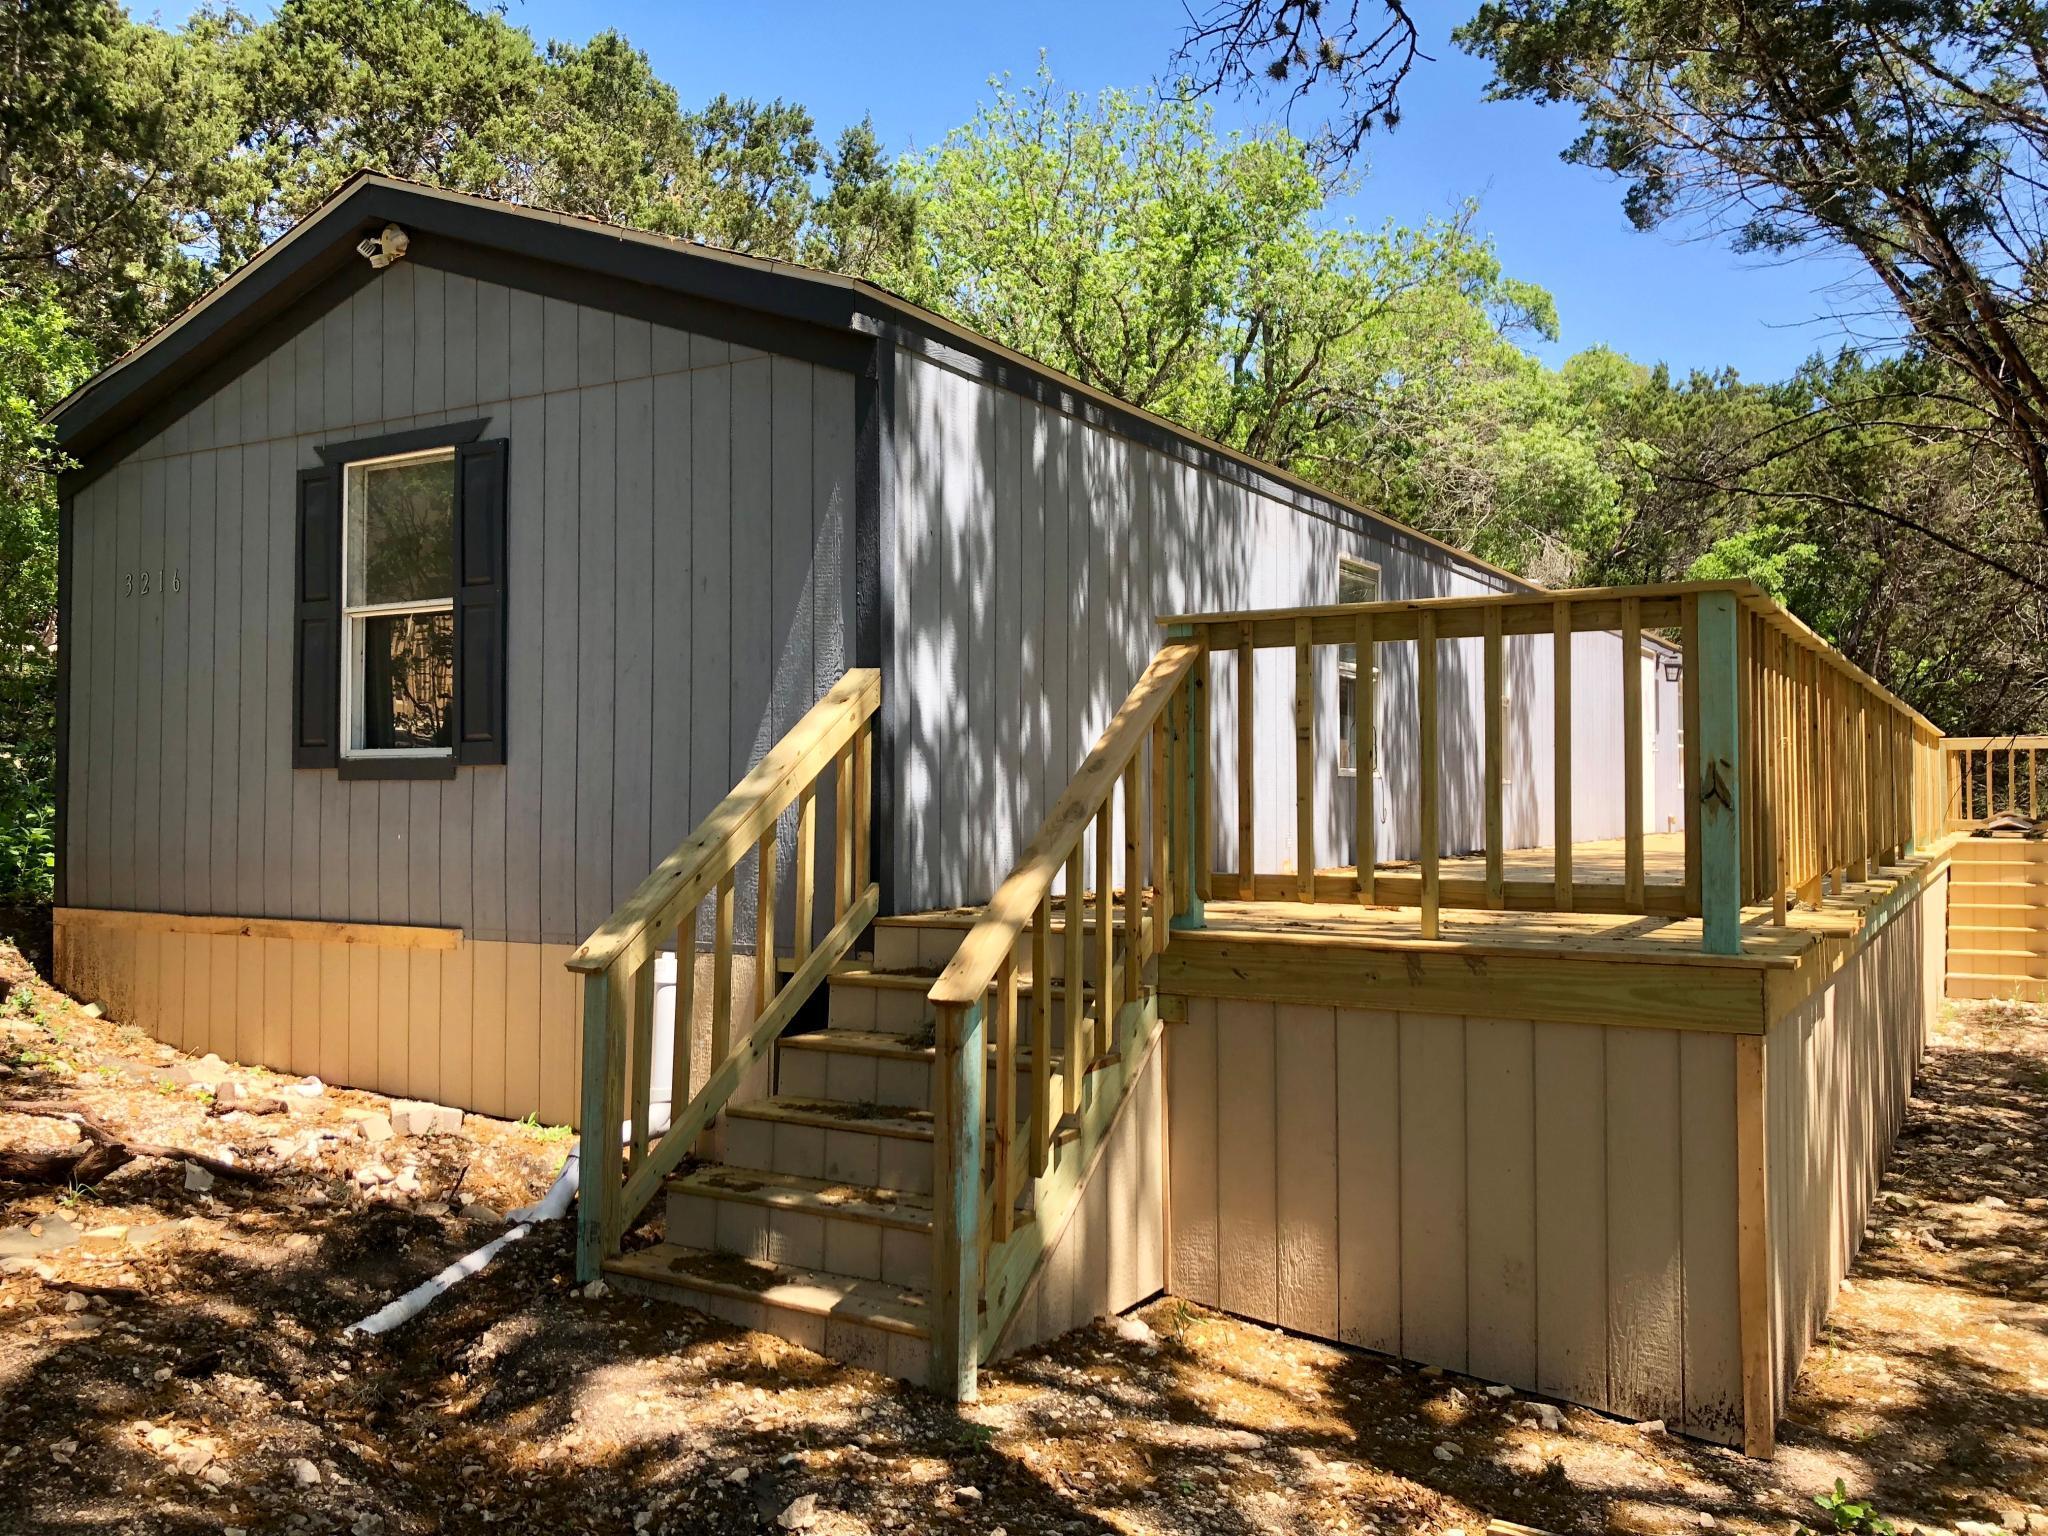 8840 Cross Mountain Trl #104, San Antonio, TX 78255 For Rent | Trulia